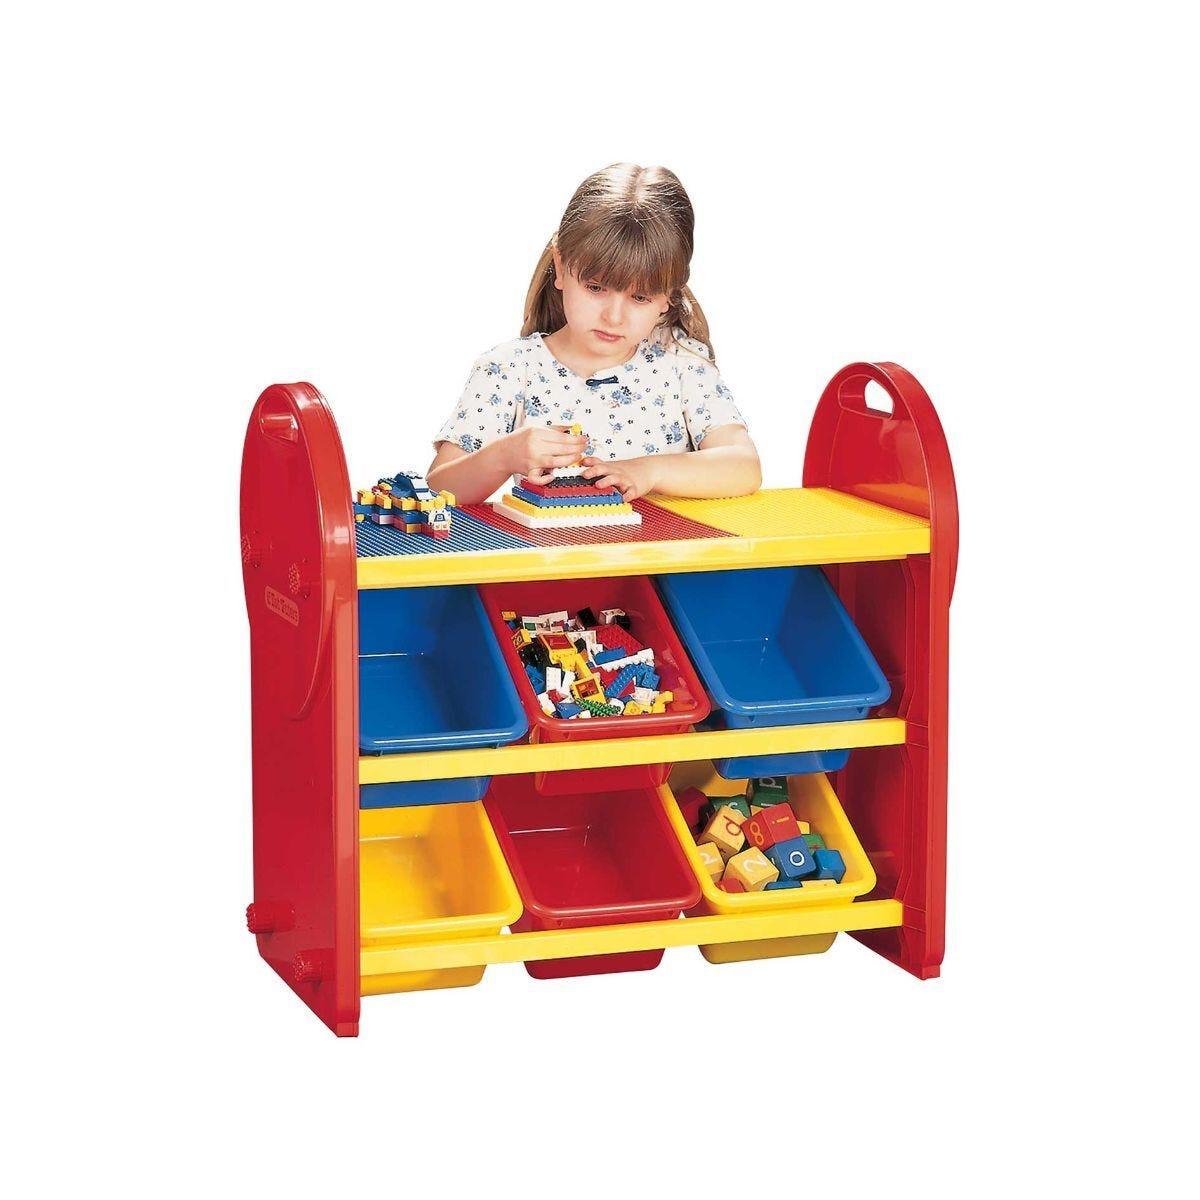 Childrens Plastic Storage 6 Bin Play Organiser